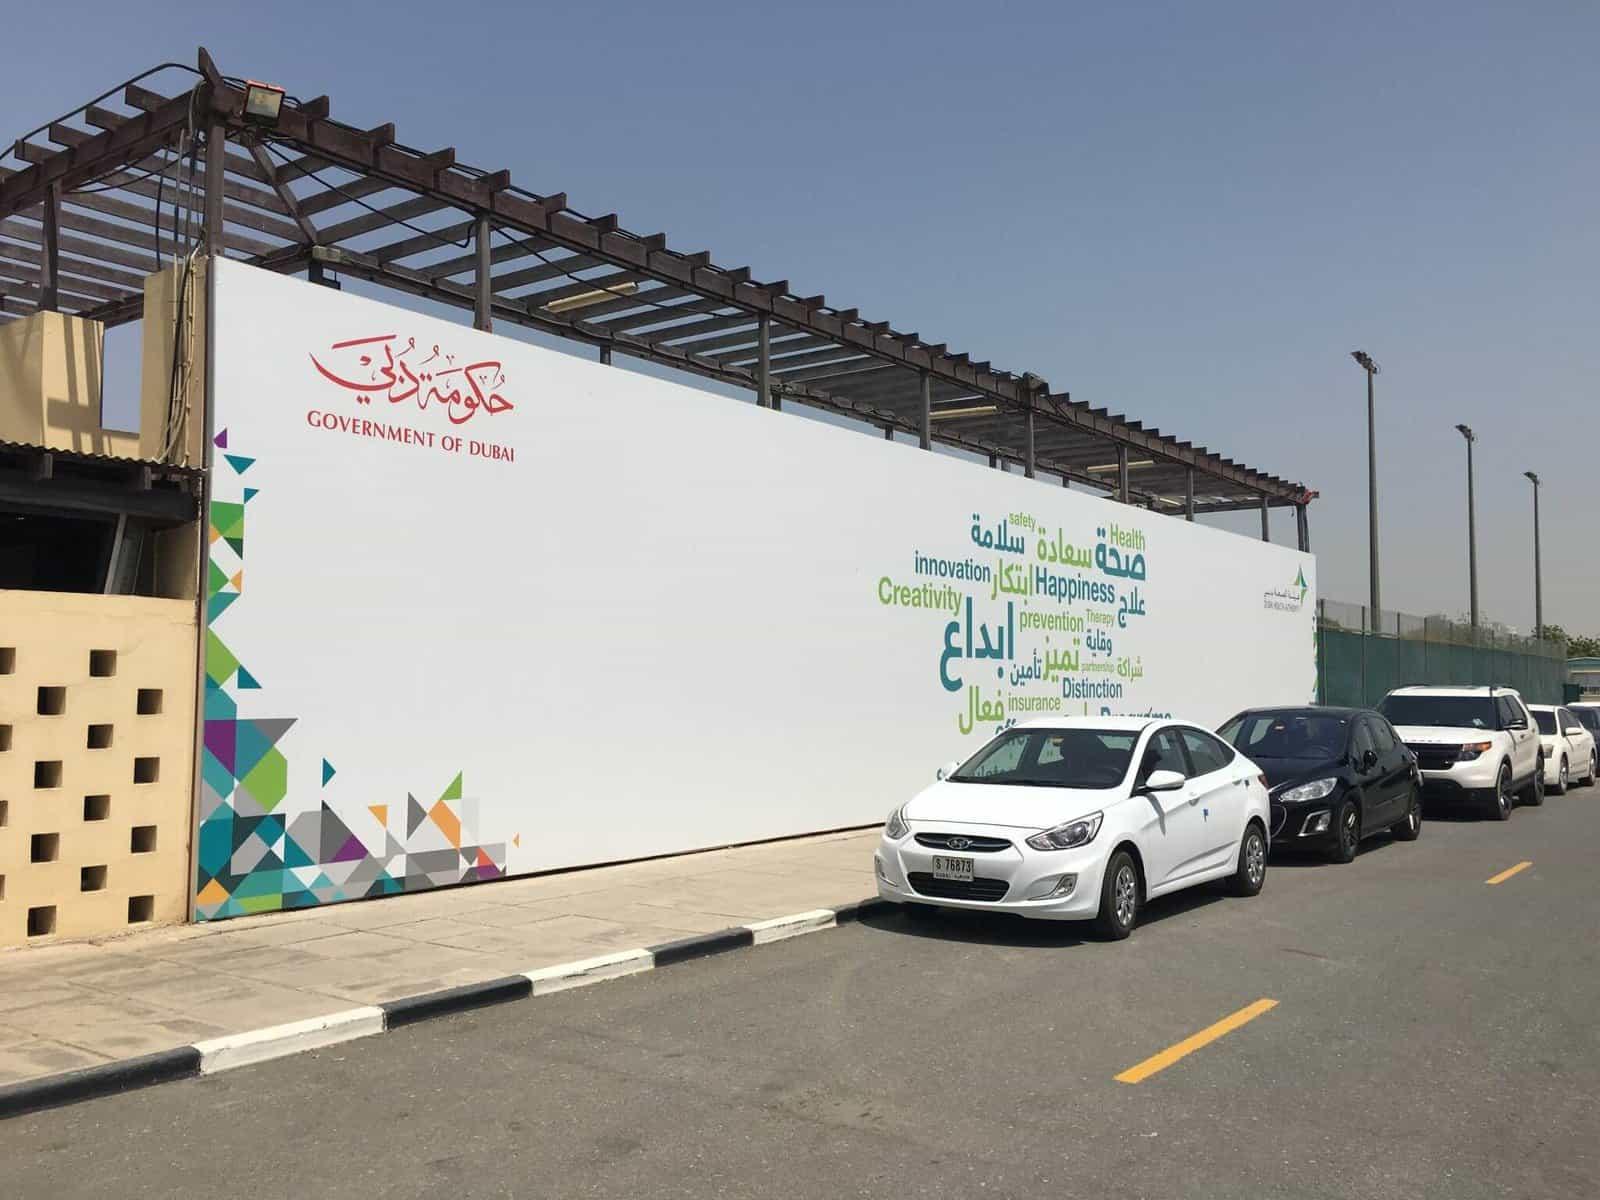 gcc uae qatar bahrain oman saudi kuwait mena gcc restraint training violence management